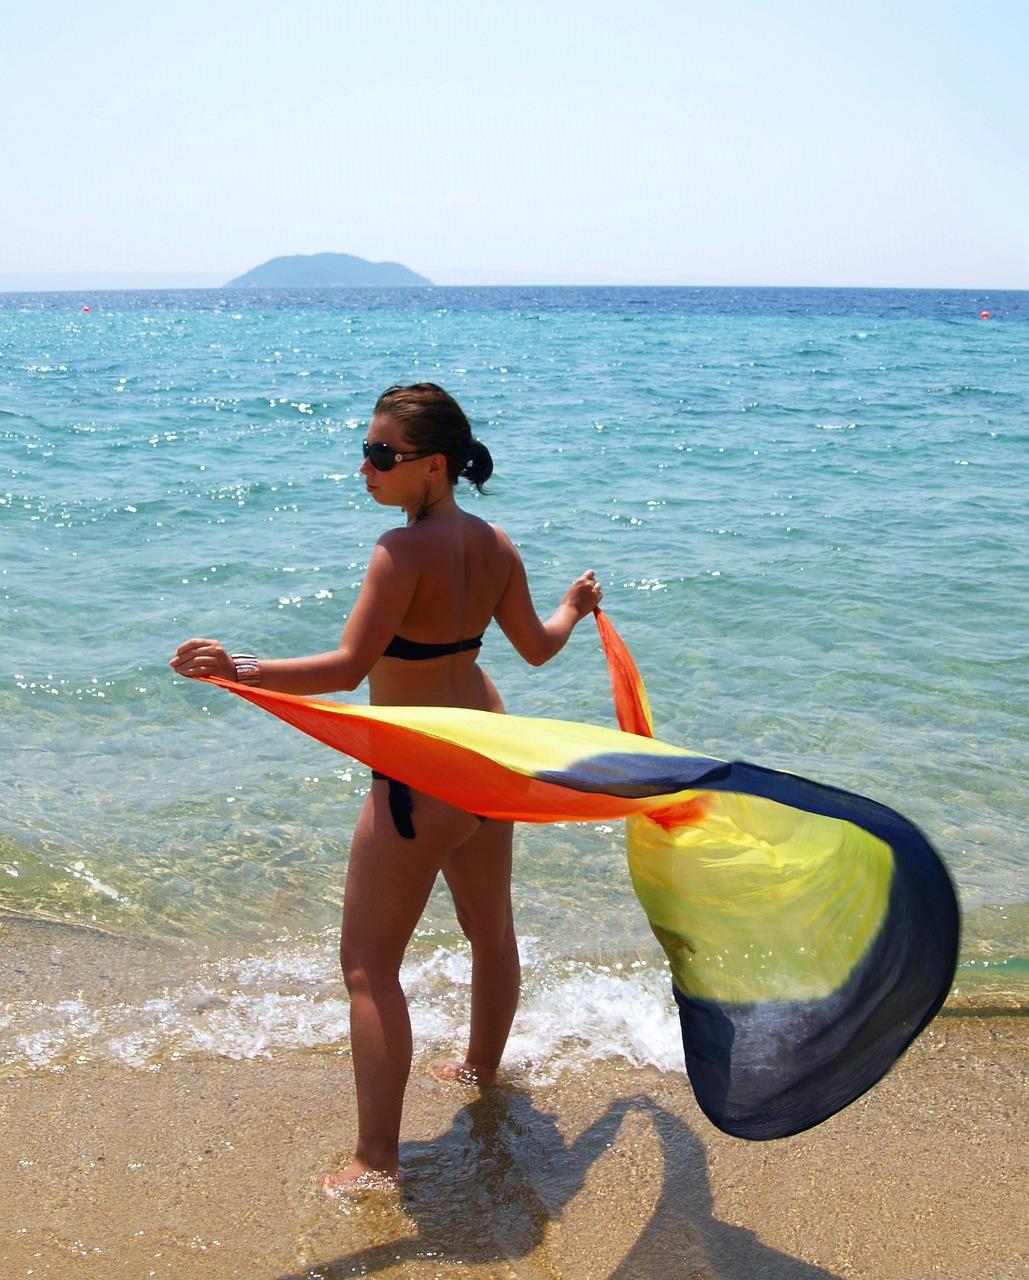 Девочки на пляже летом фото